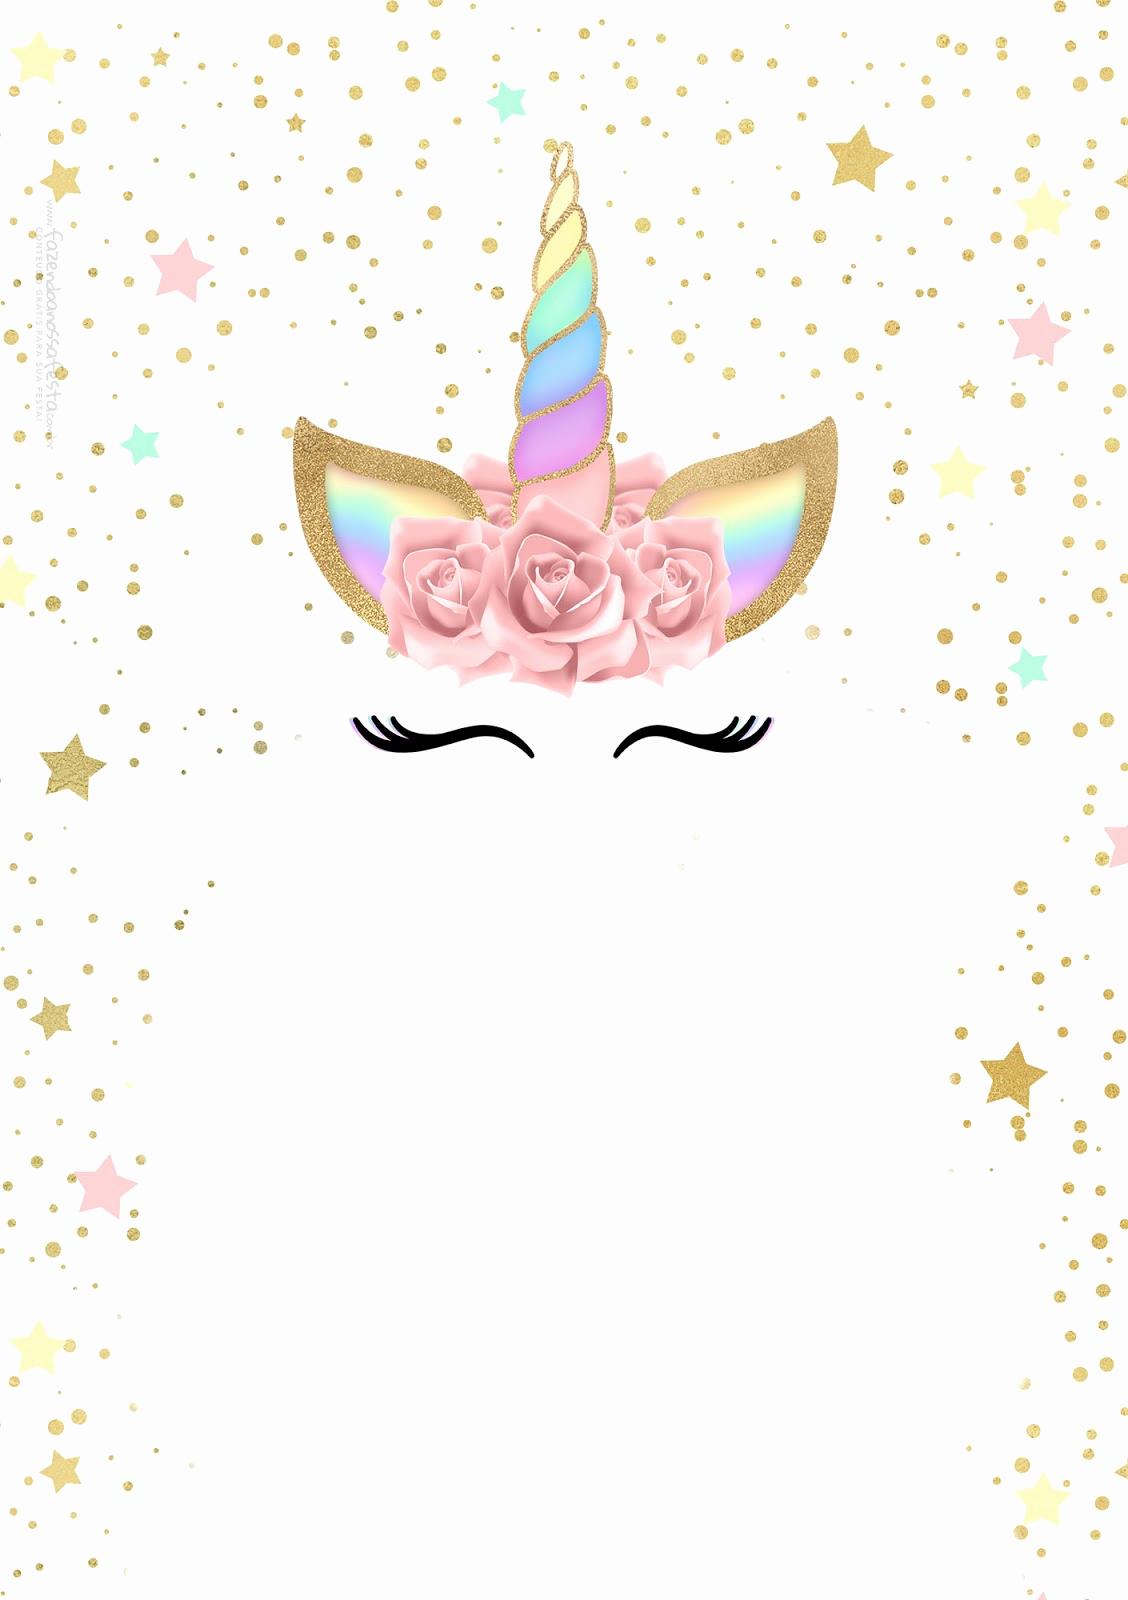 Unicorn Invitation Template Free Awesome Unicorn with Rainbow Free Printable Invitations Oh My